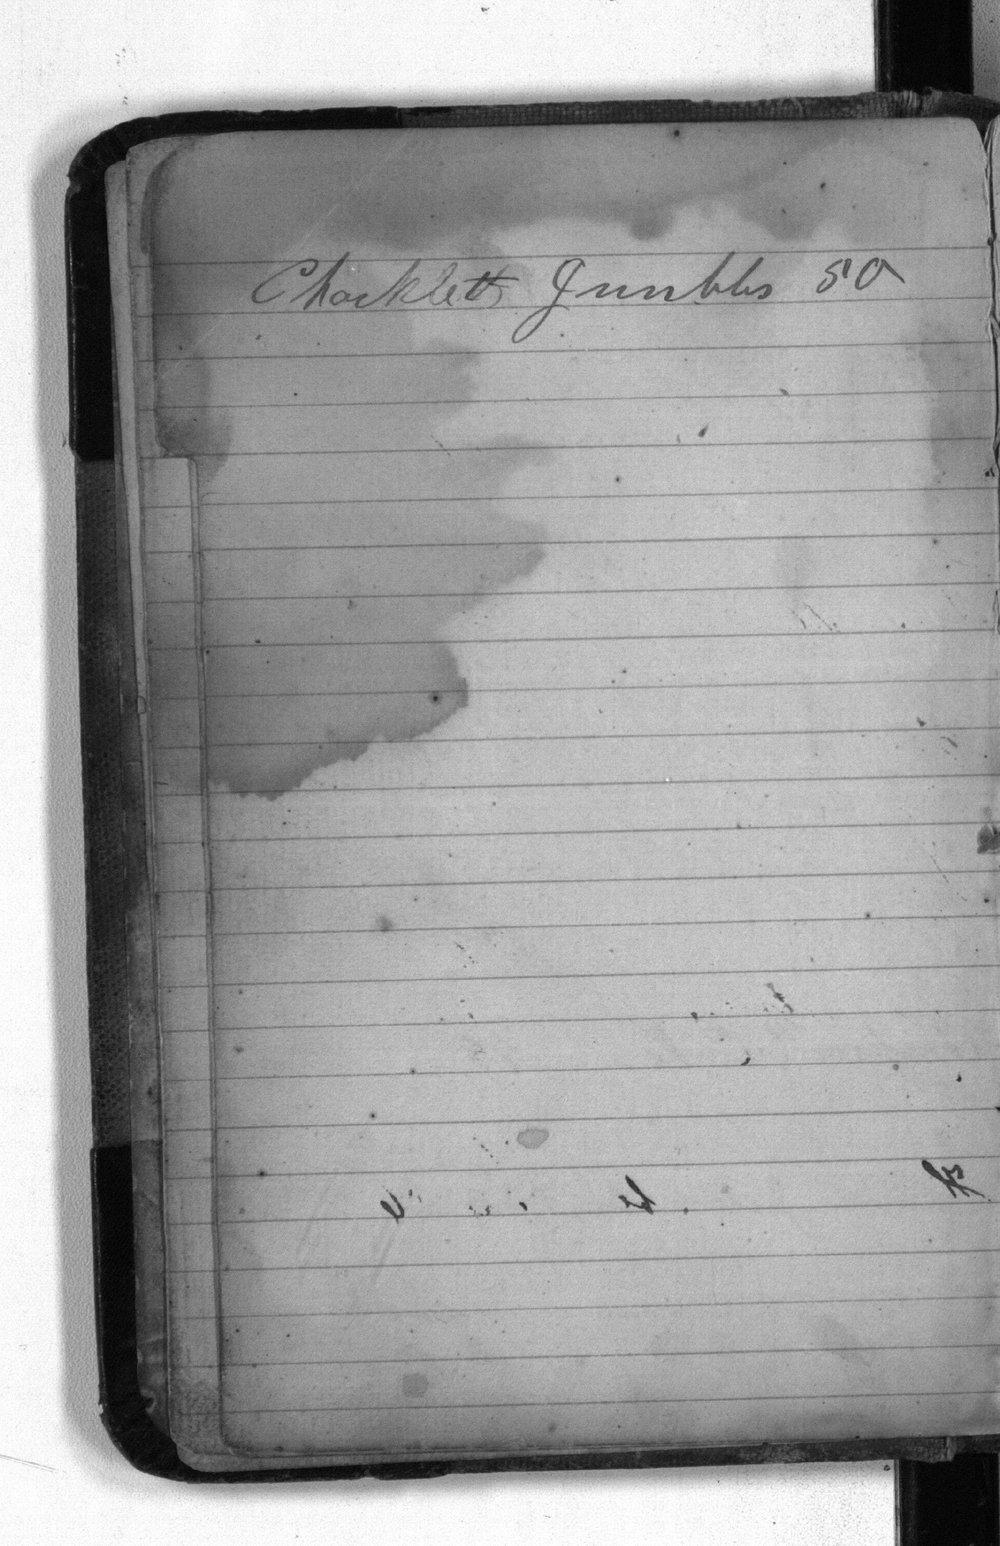 F. W. Yanner cookbook - Index